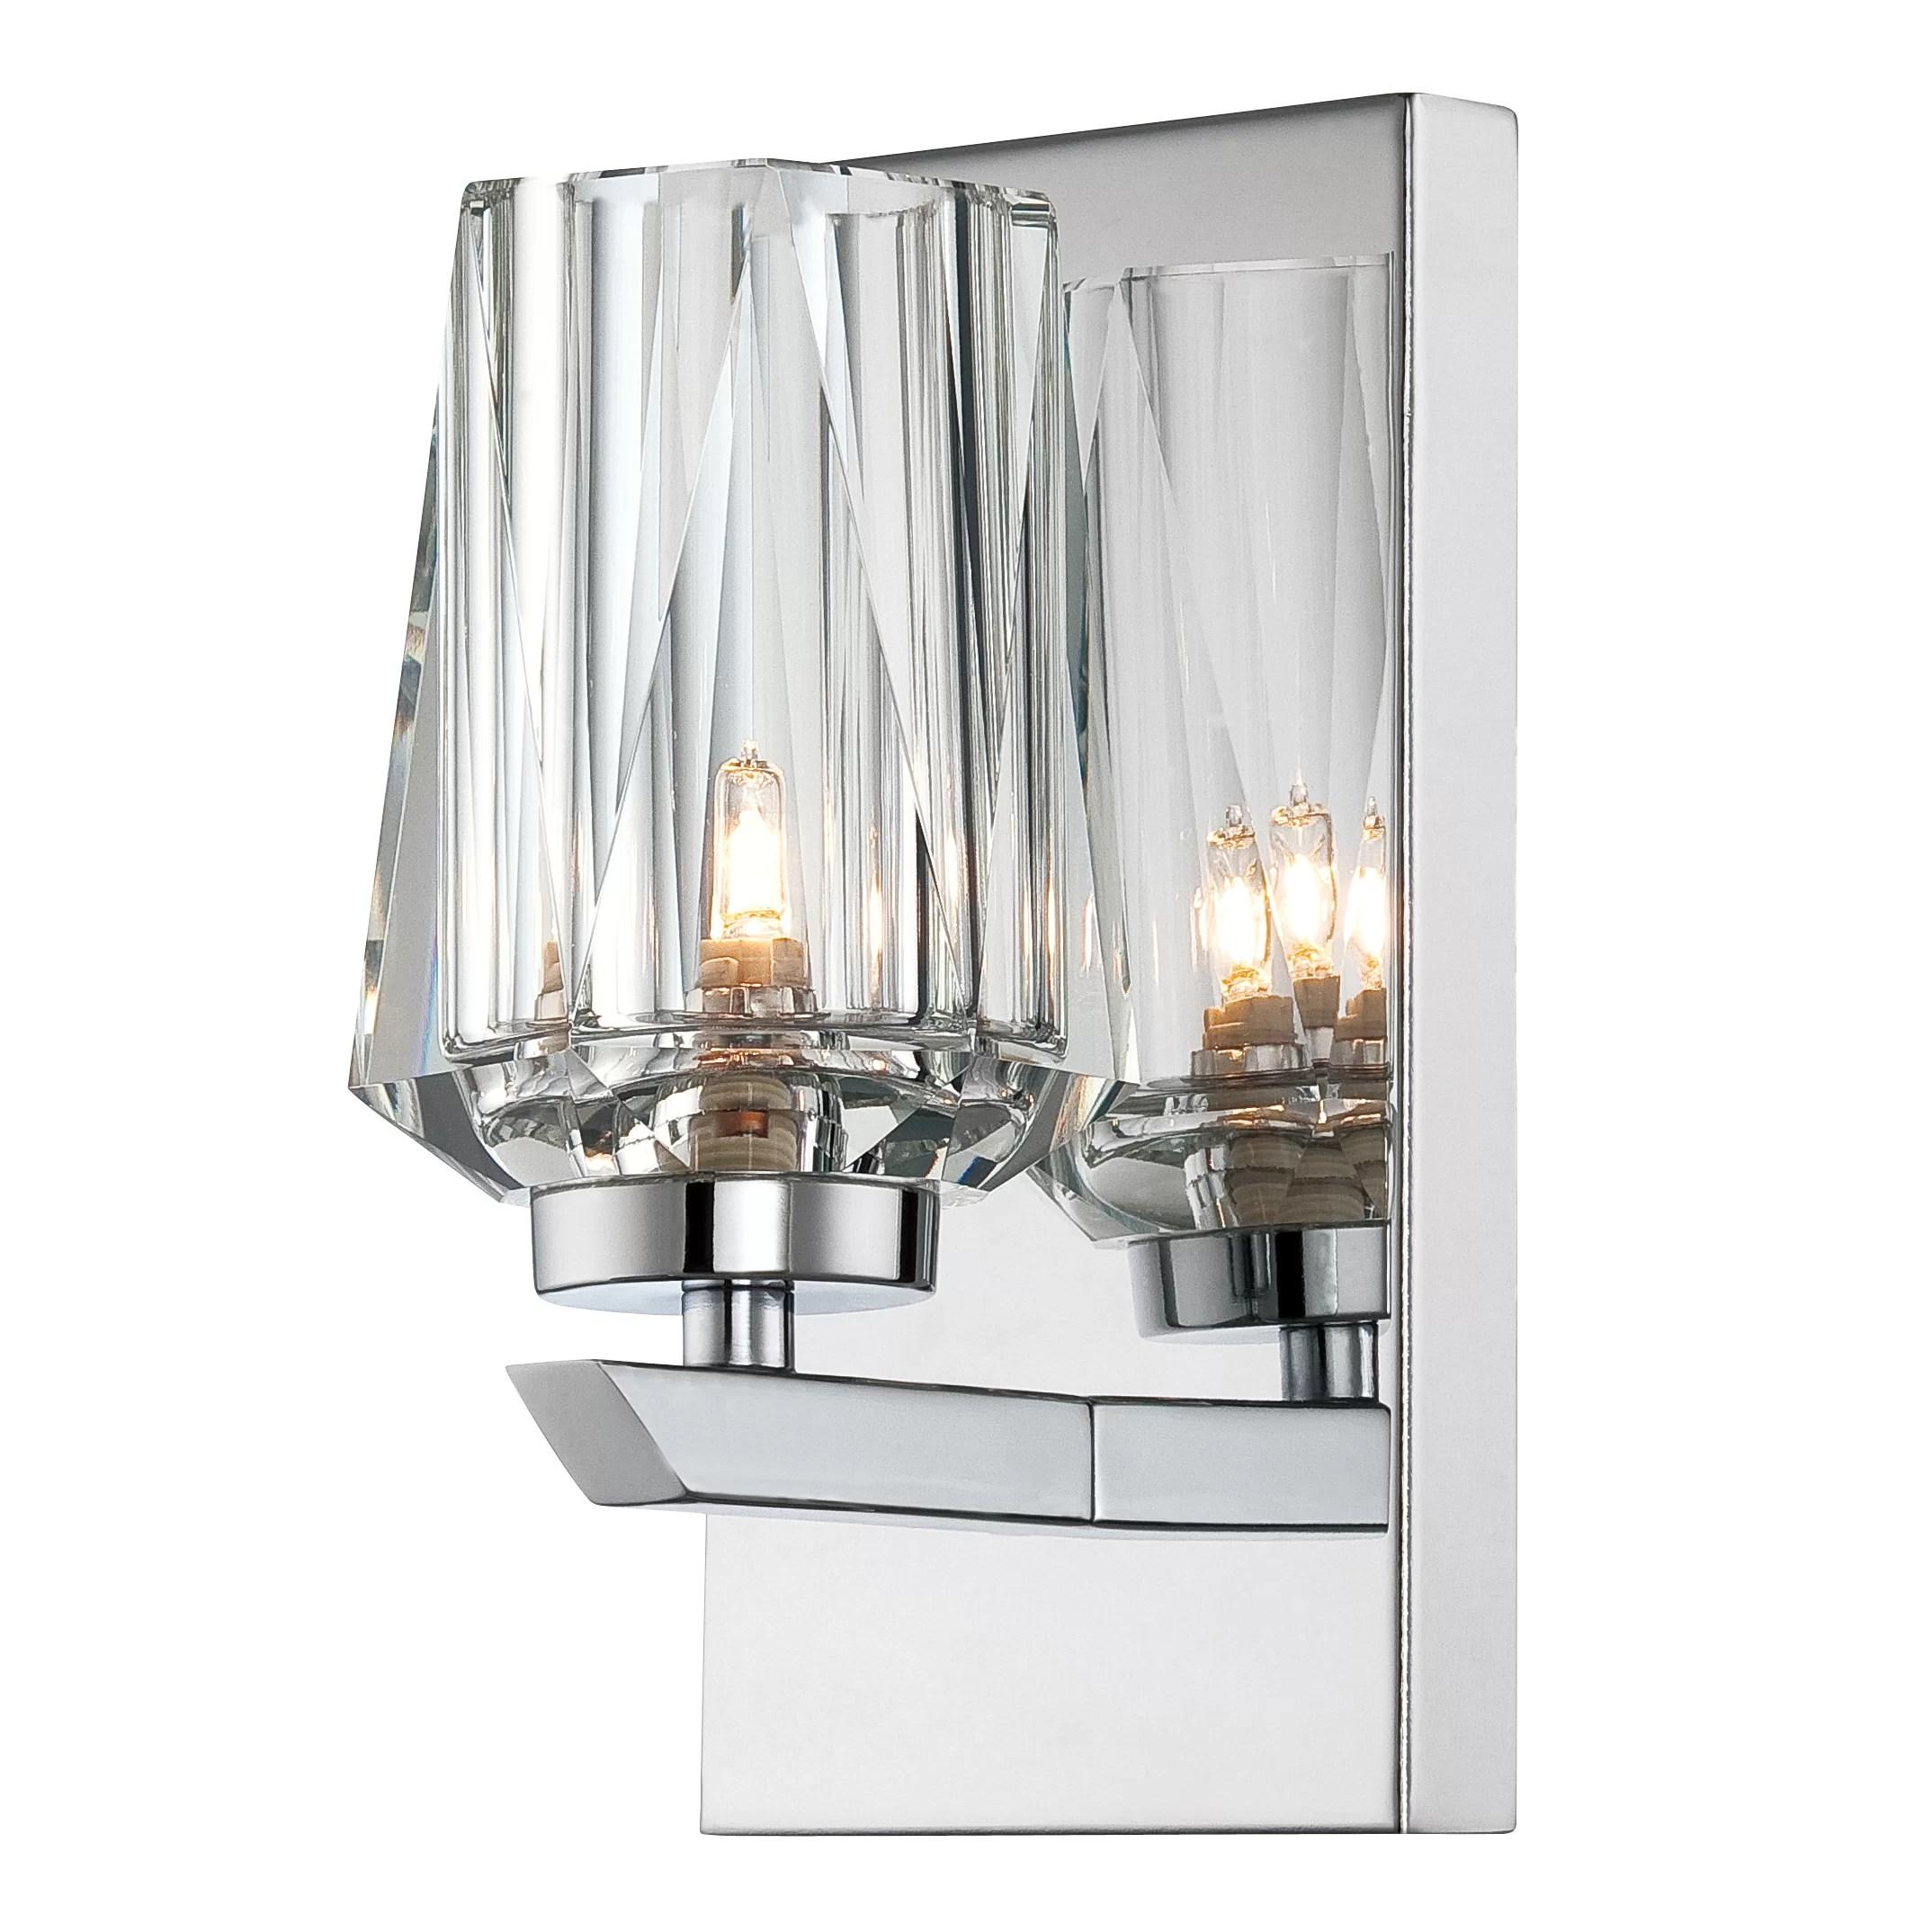 Alternating Current Ginsu 1 Light Bath Wall Sconce ... on Bathroom Wall Sconce Lighting id=25265